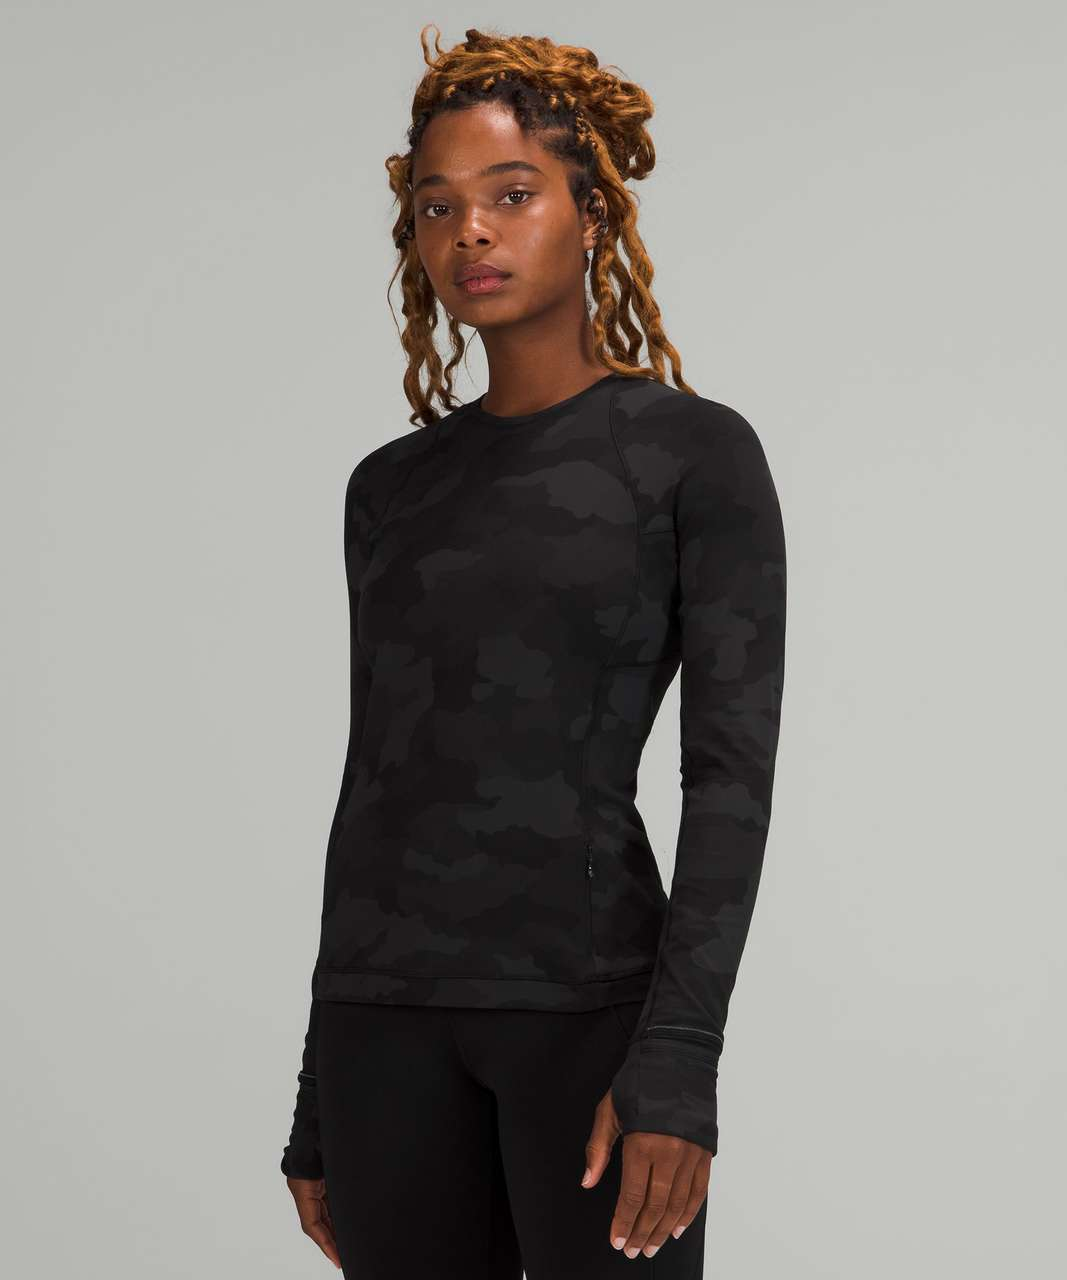 Lululemon Its Rulu Run Long Sleeve Shirt - Heritage 365 Camo Deep Coal Multi